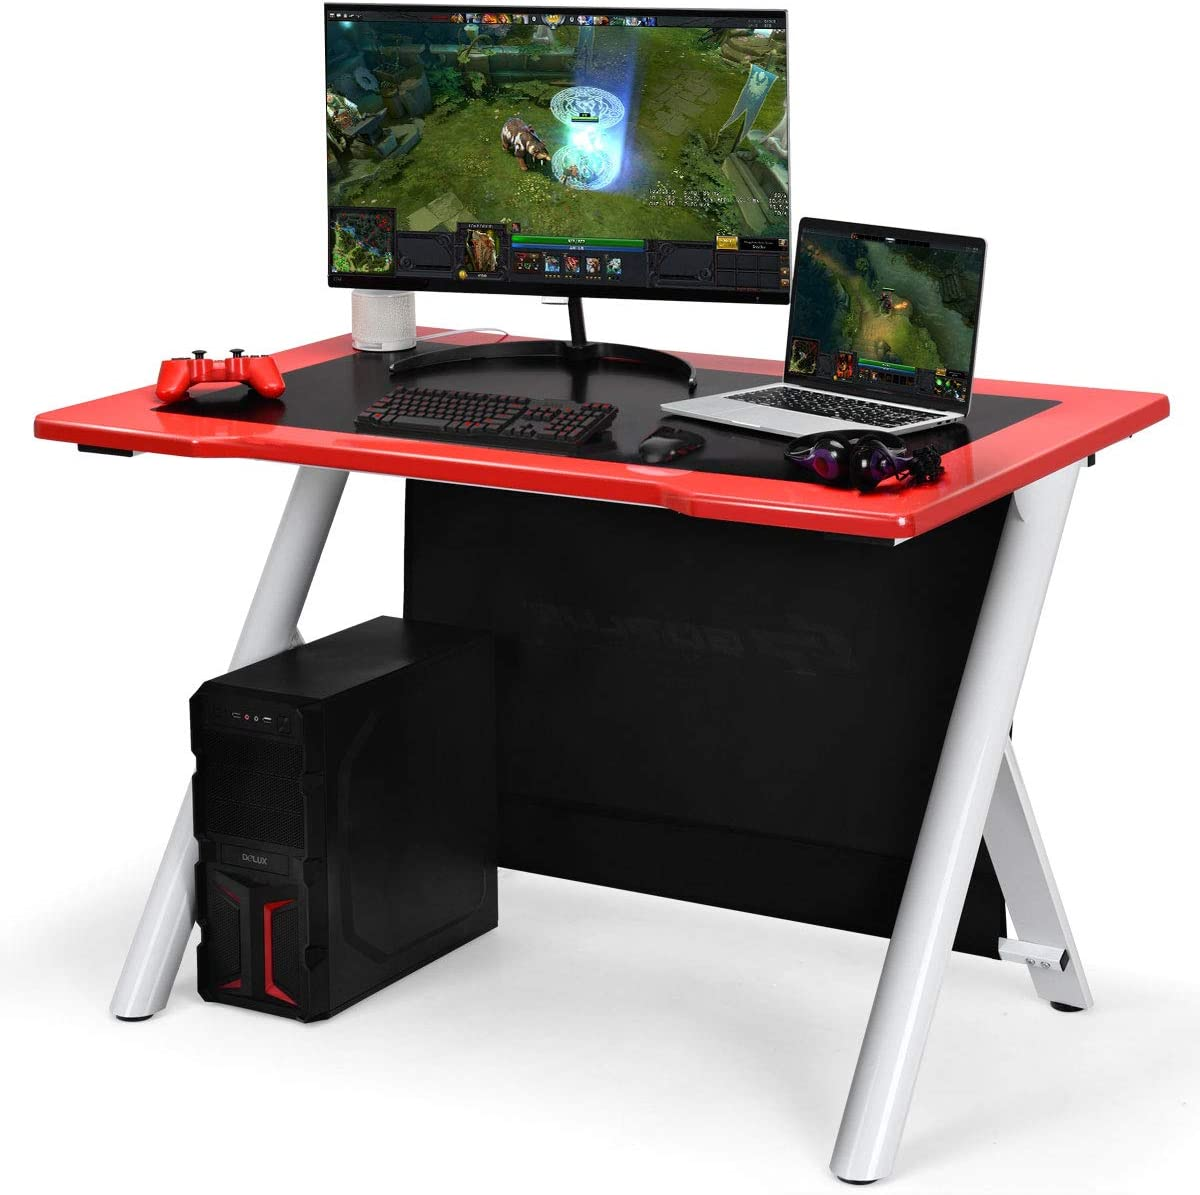 Tangkula Gaming Desk, Gaming Computer Desk, Gamers Computer Desk, Gaming Workstation, Computer Desk PC Desk 45 X29.5 Lx W